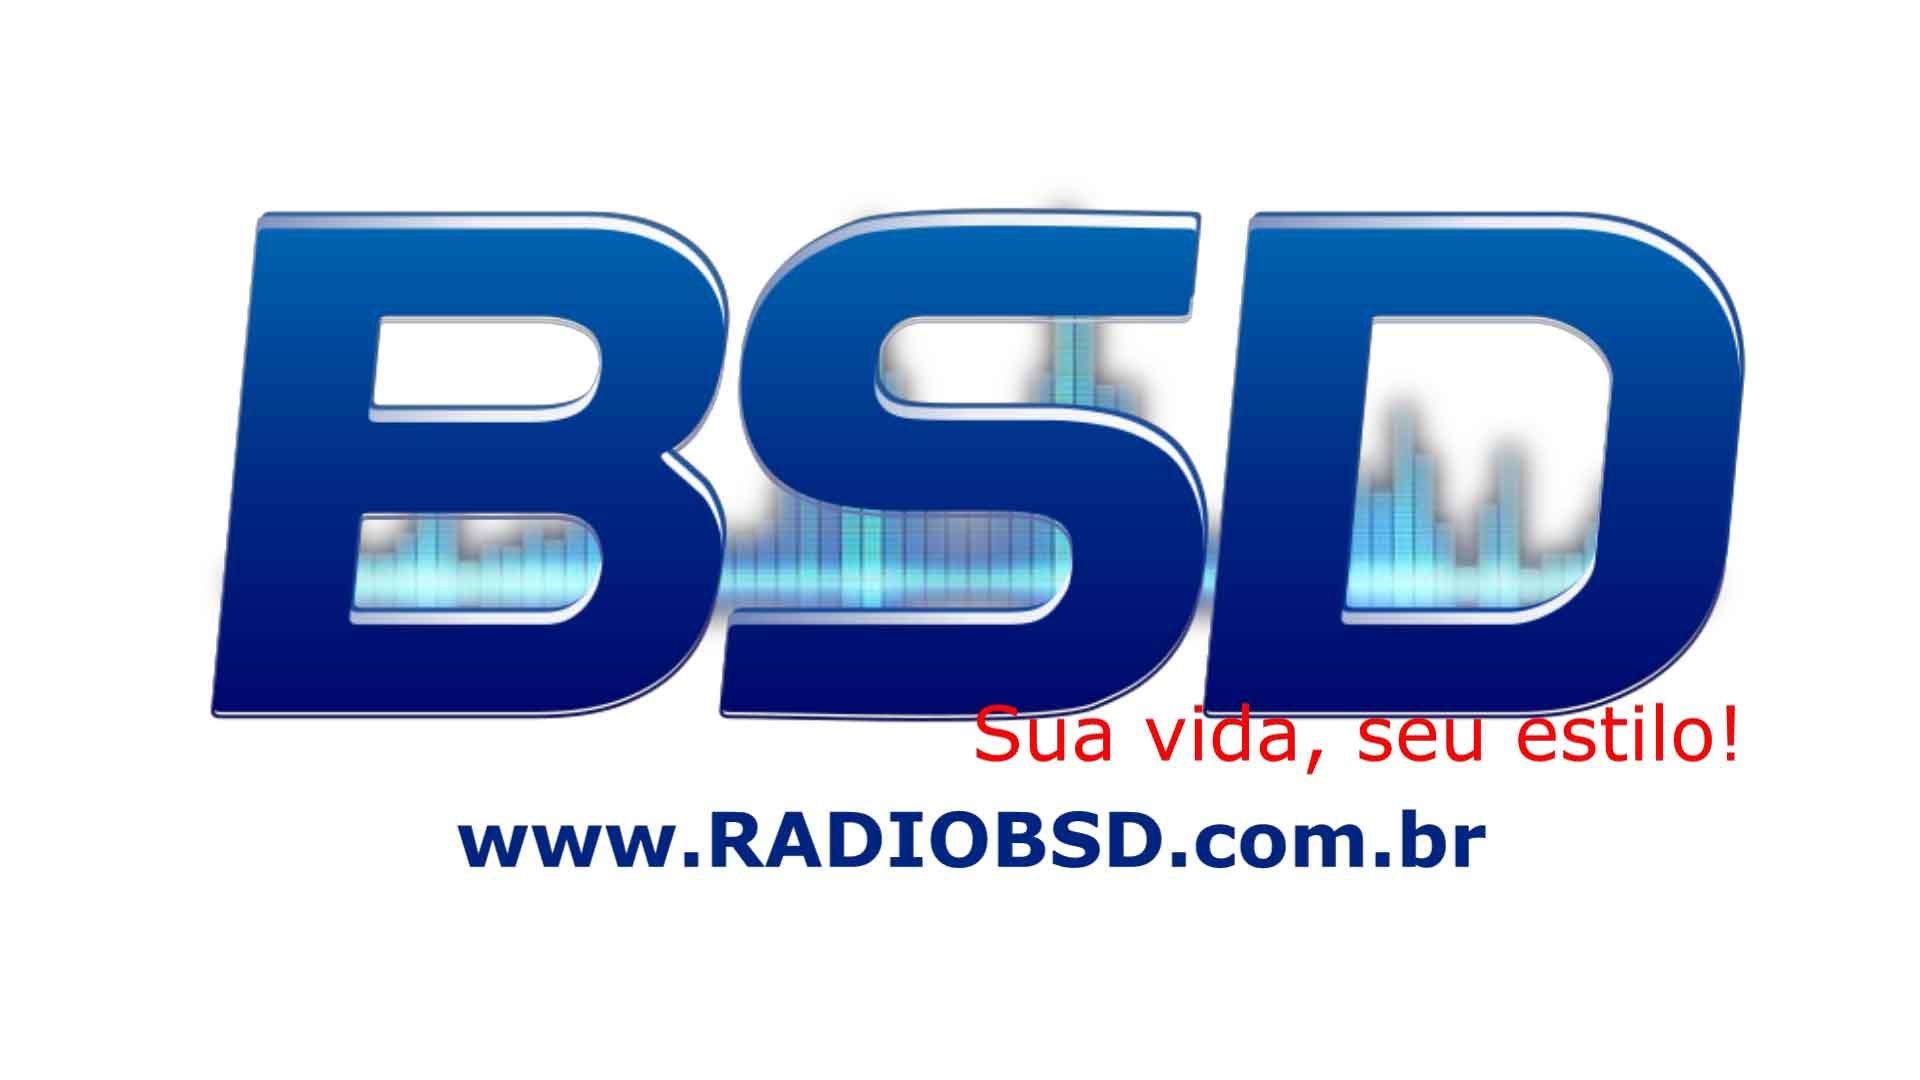 Rádio BSD